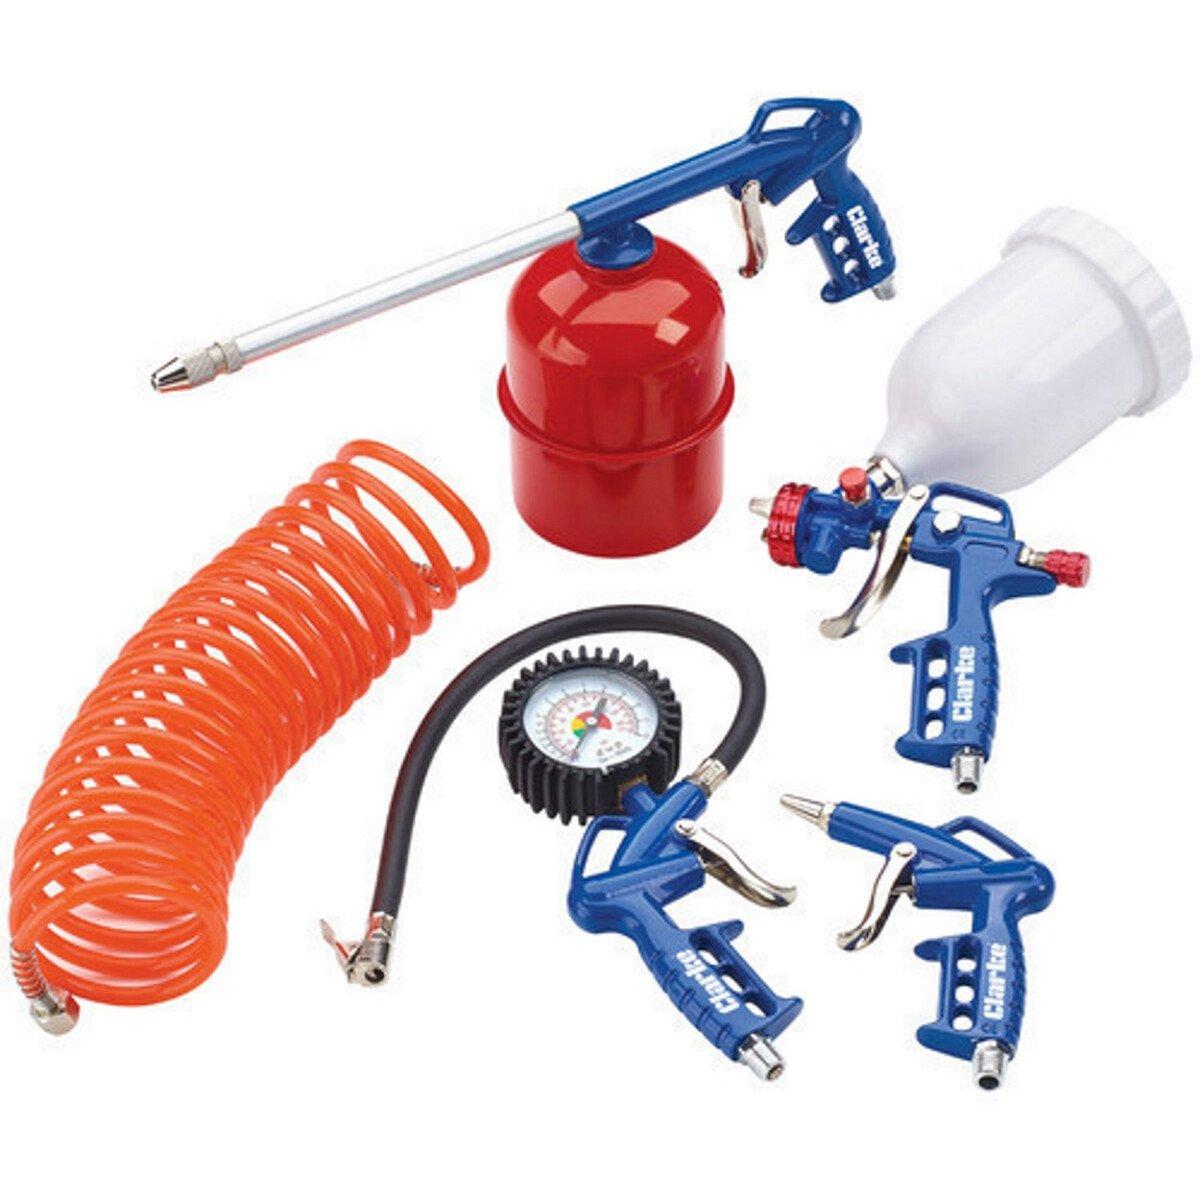 Clarke KIT1100 5 Piece Air Tool Kit with Gravity Fed Spray  3110157